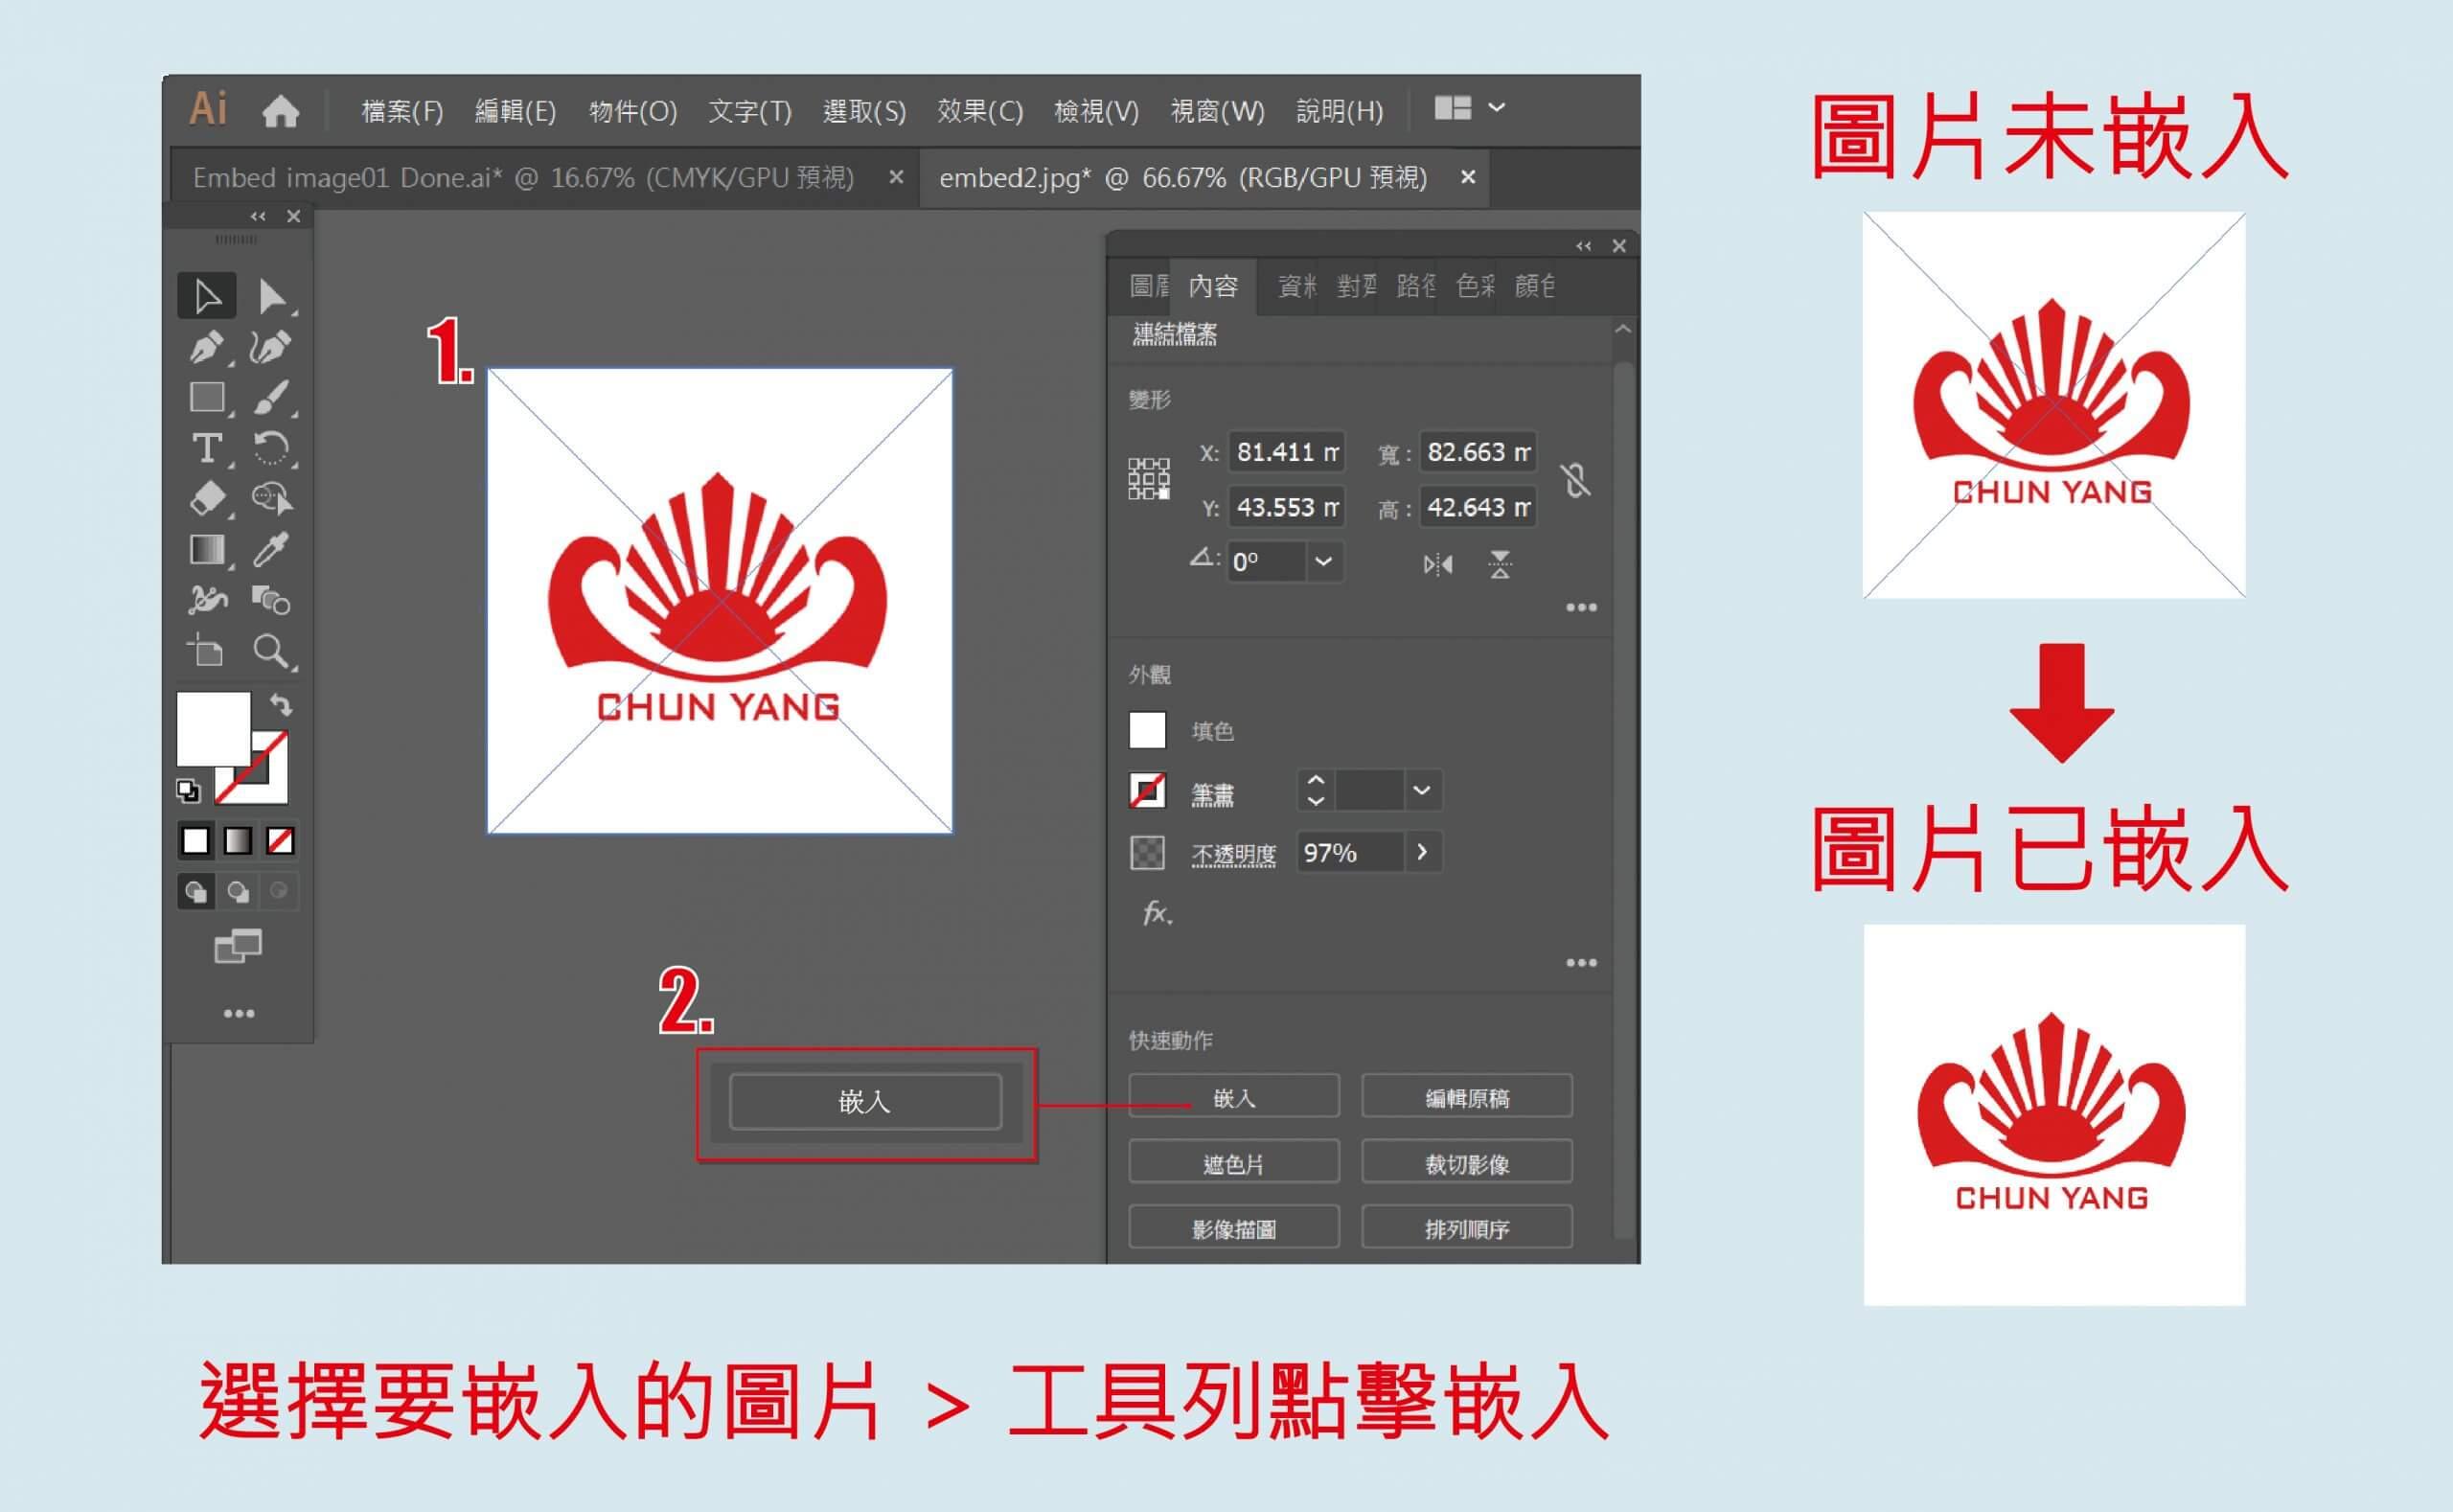 Embed image 中文